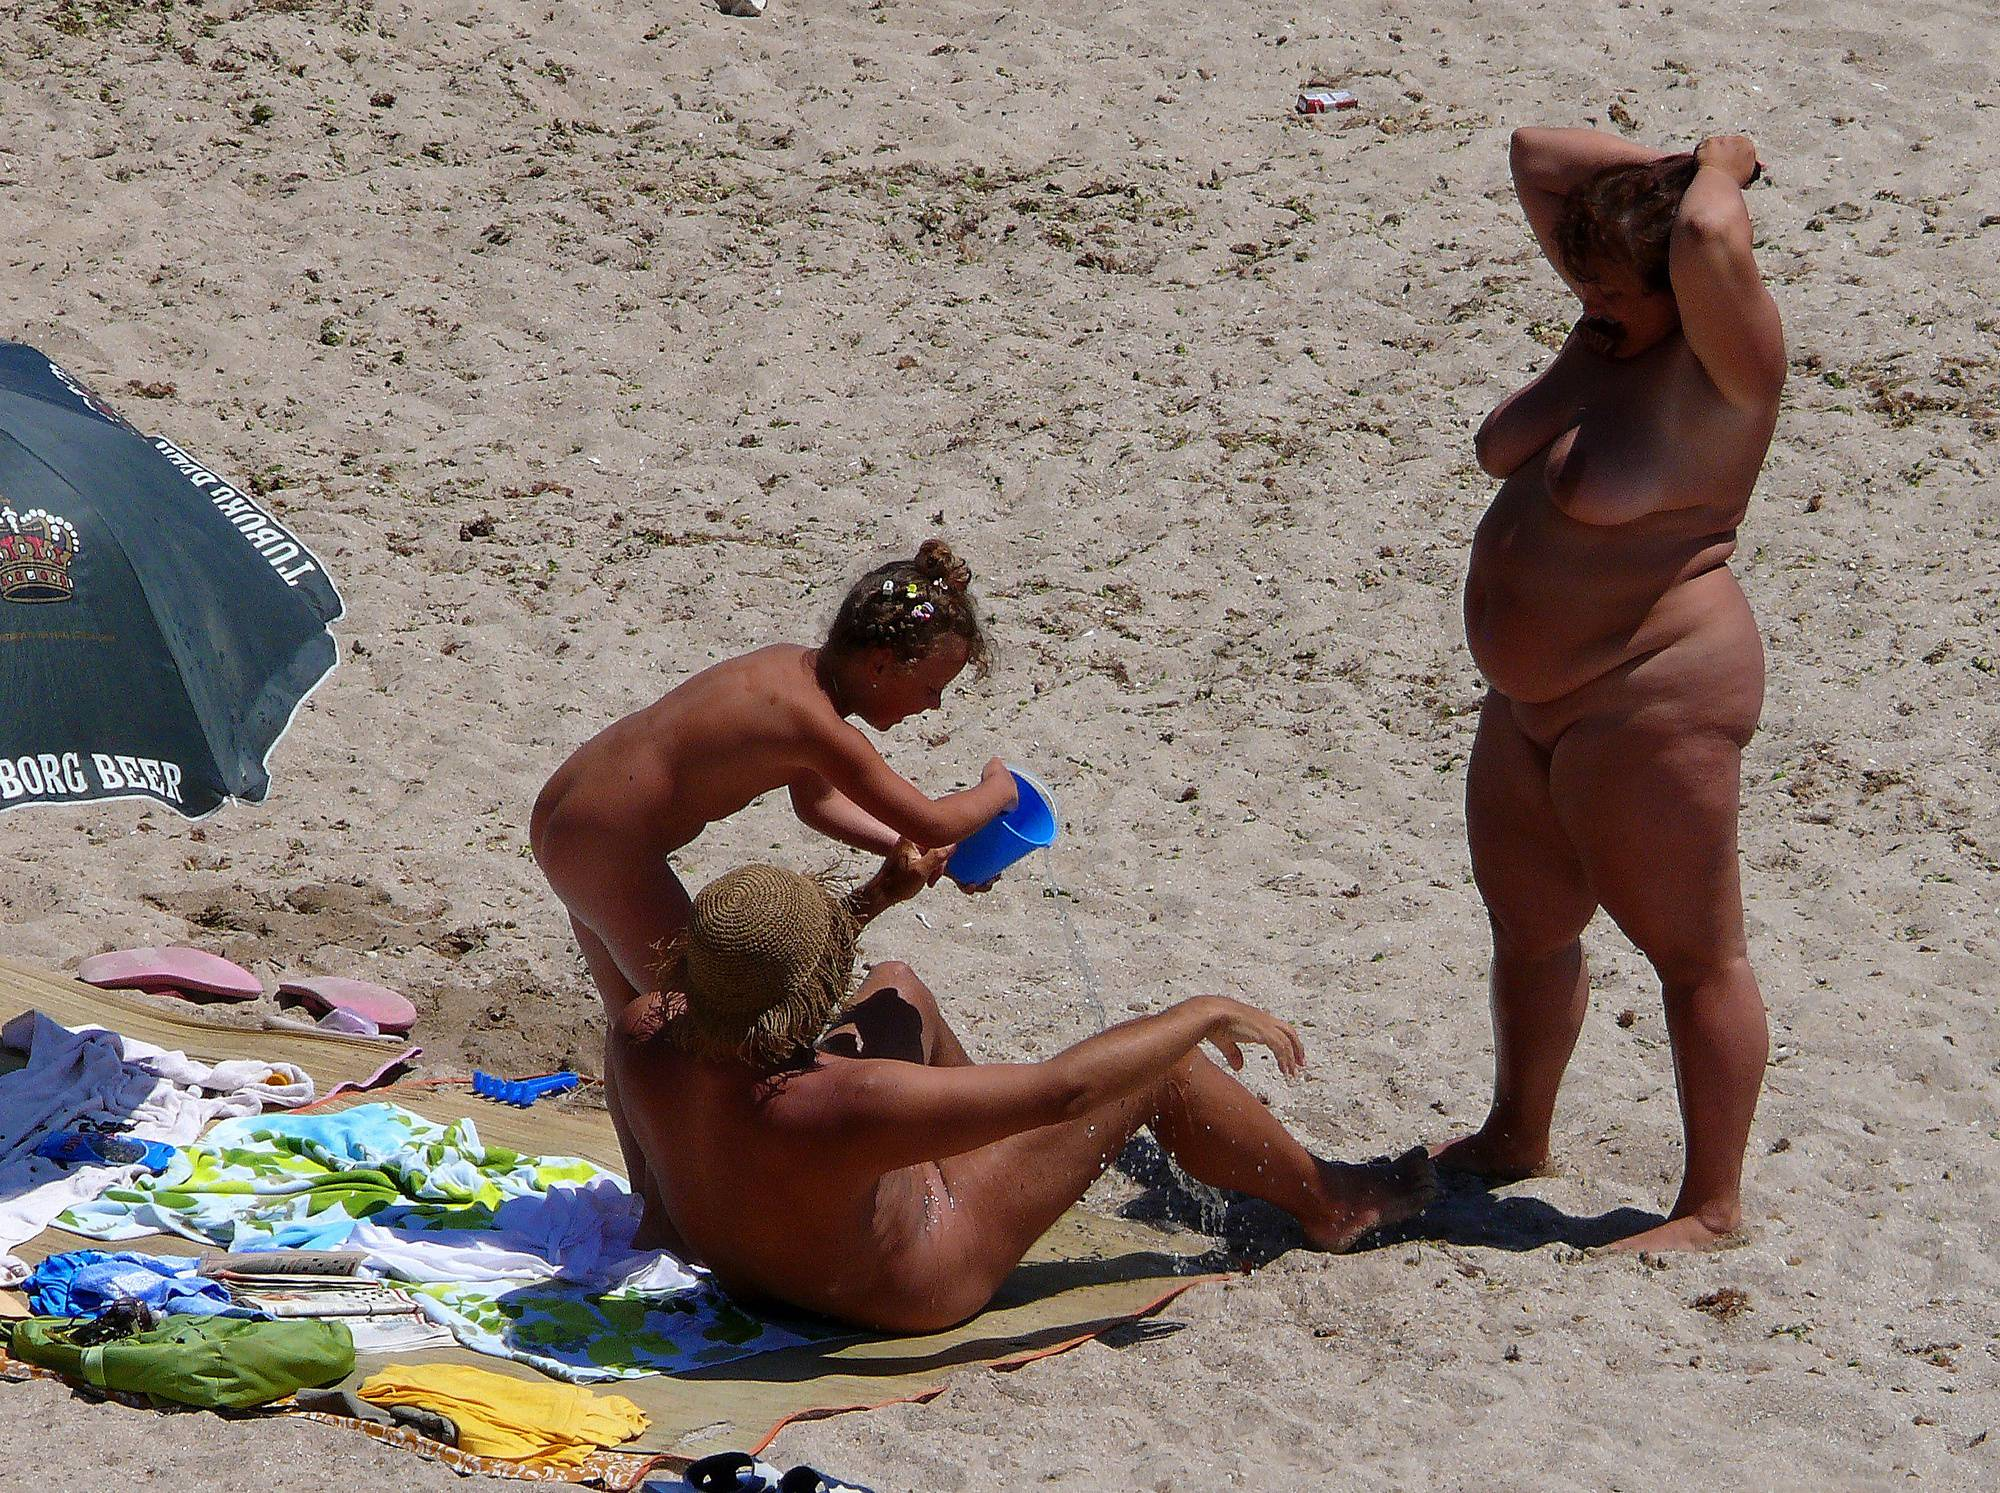 Pure Nudism Pics-Romanian Girl's Family - 3